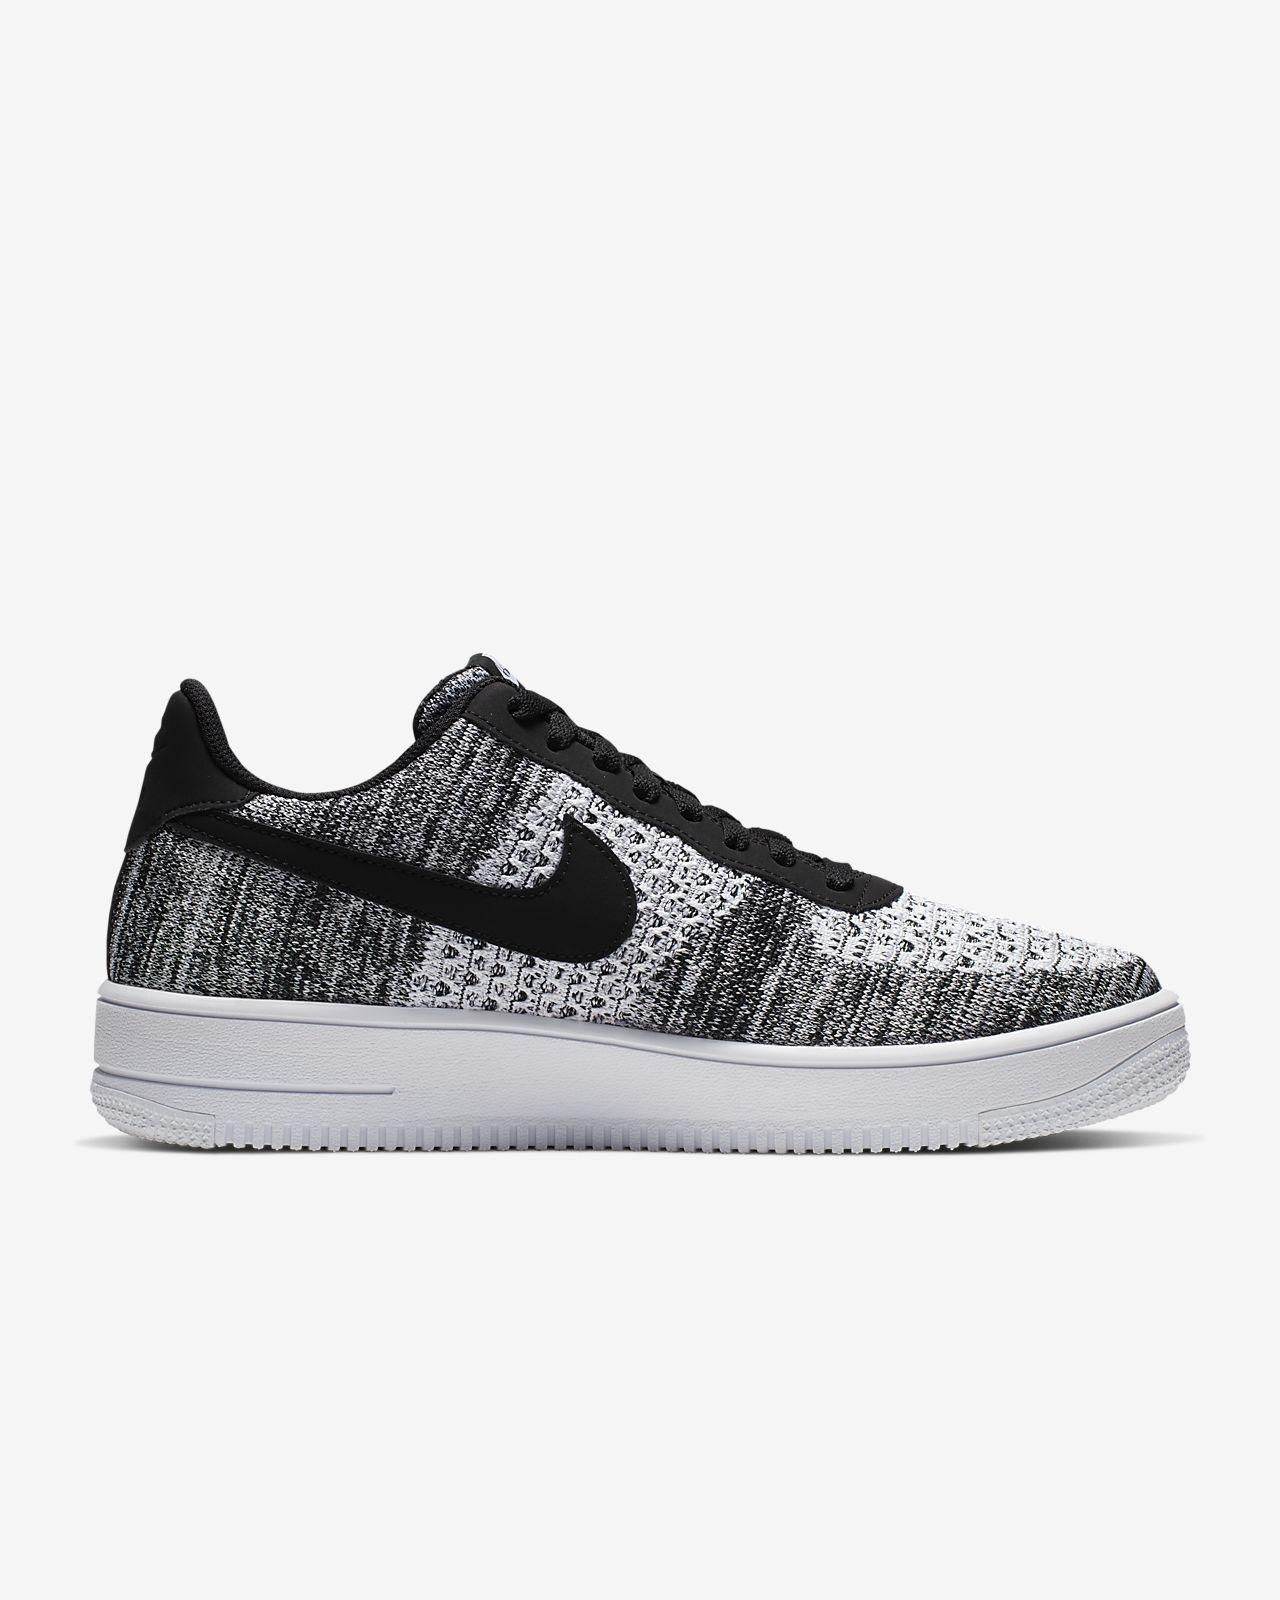 promo code c9ec6 f2d04 Low Resolution Nike Air Force 1 Flyknit 2.0 Men s Shoe Nike Air Force 1  Flyknit 2.0 Men s Shoe